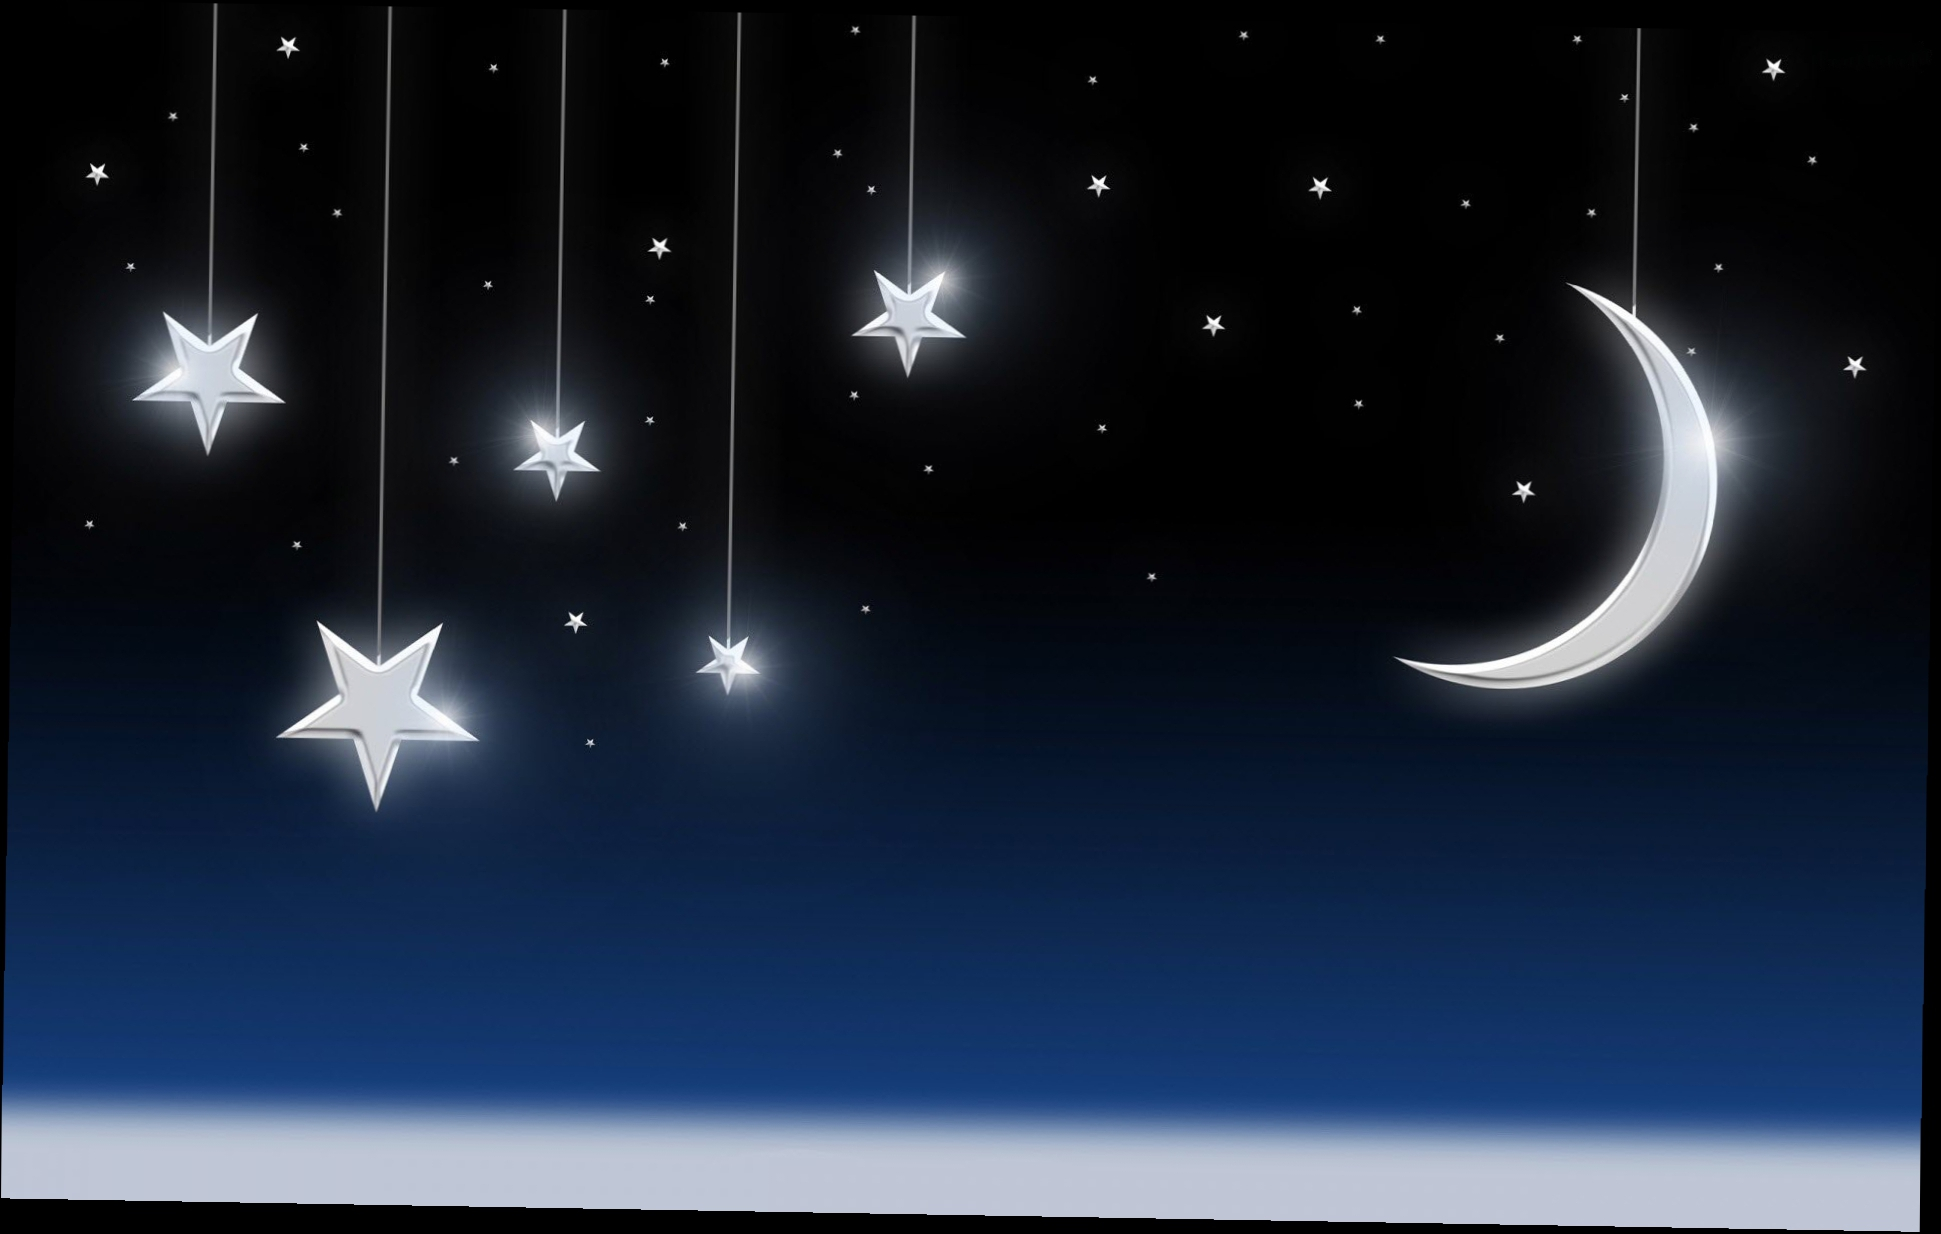 3d Cross Wallpaper Desktop Hd Sun Moon Stars Wallpapers Pixelstalk Net